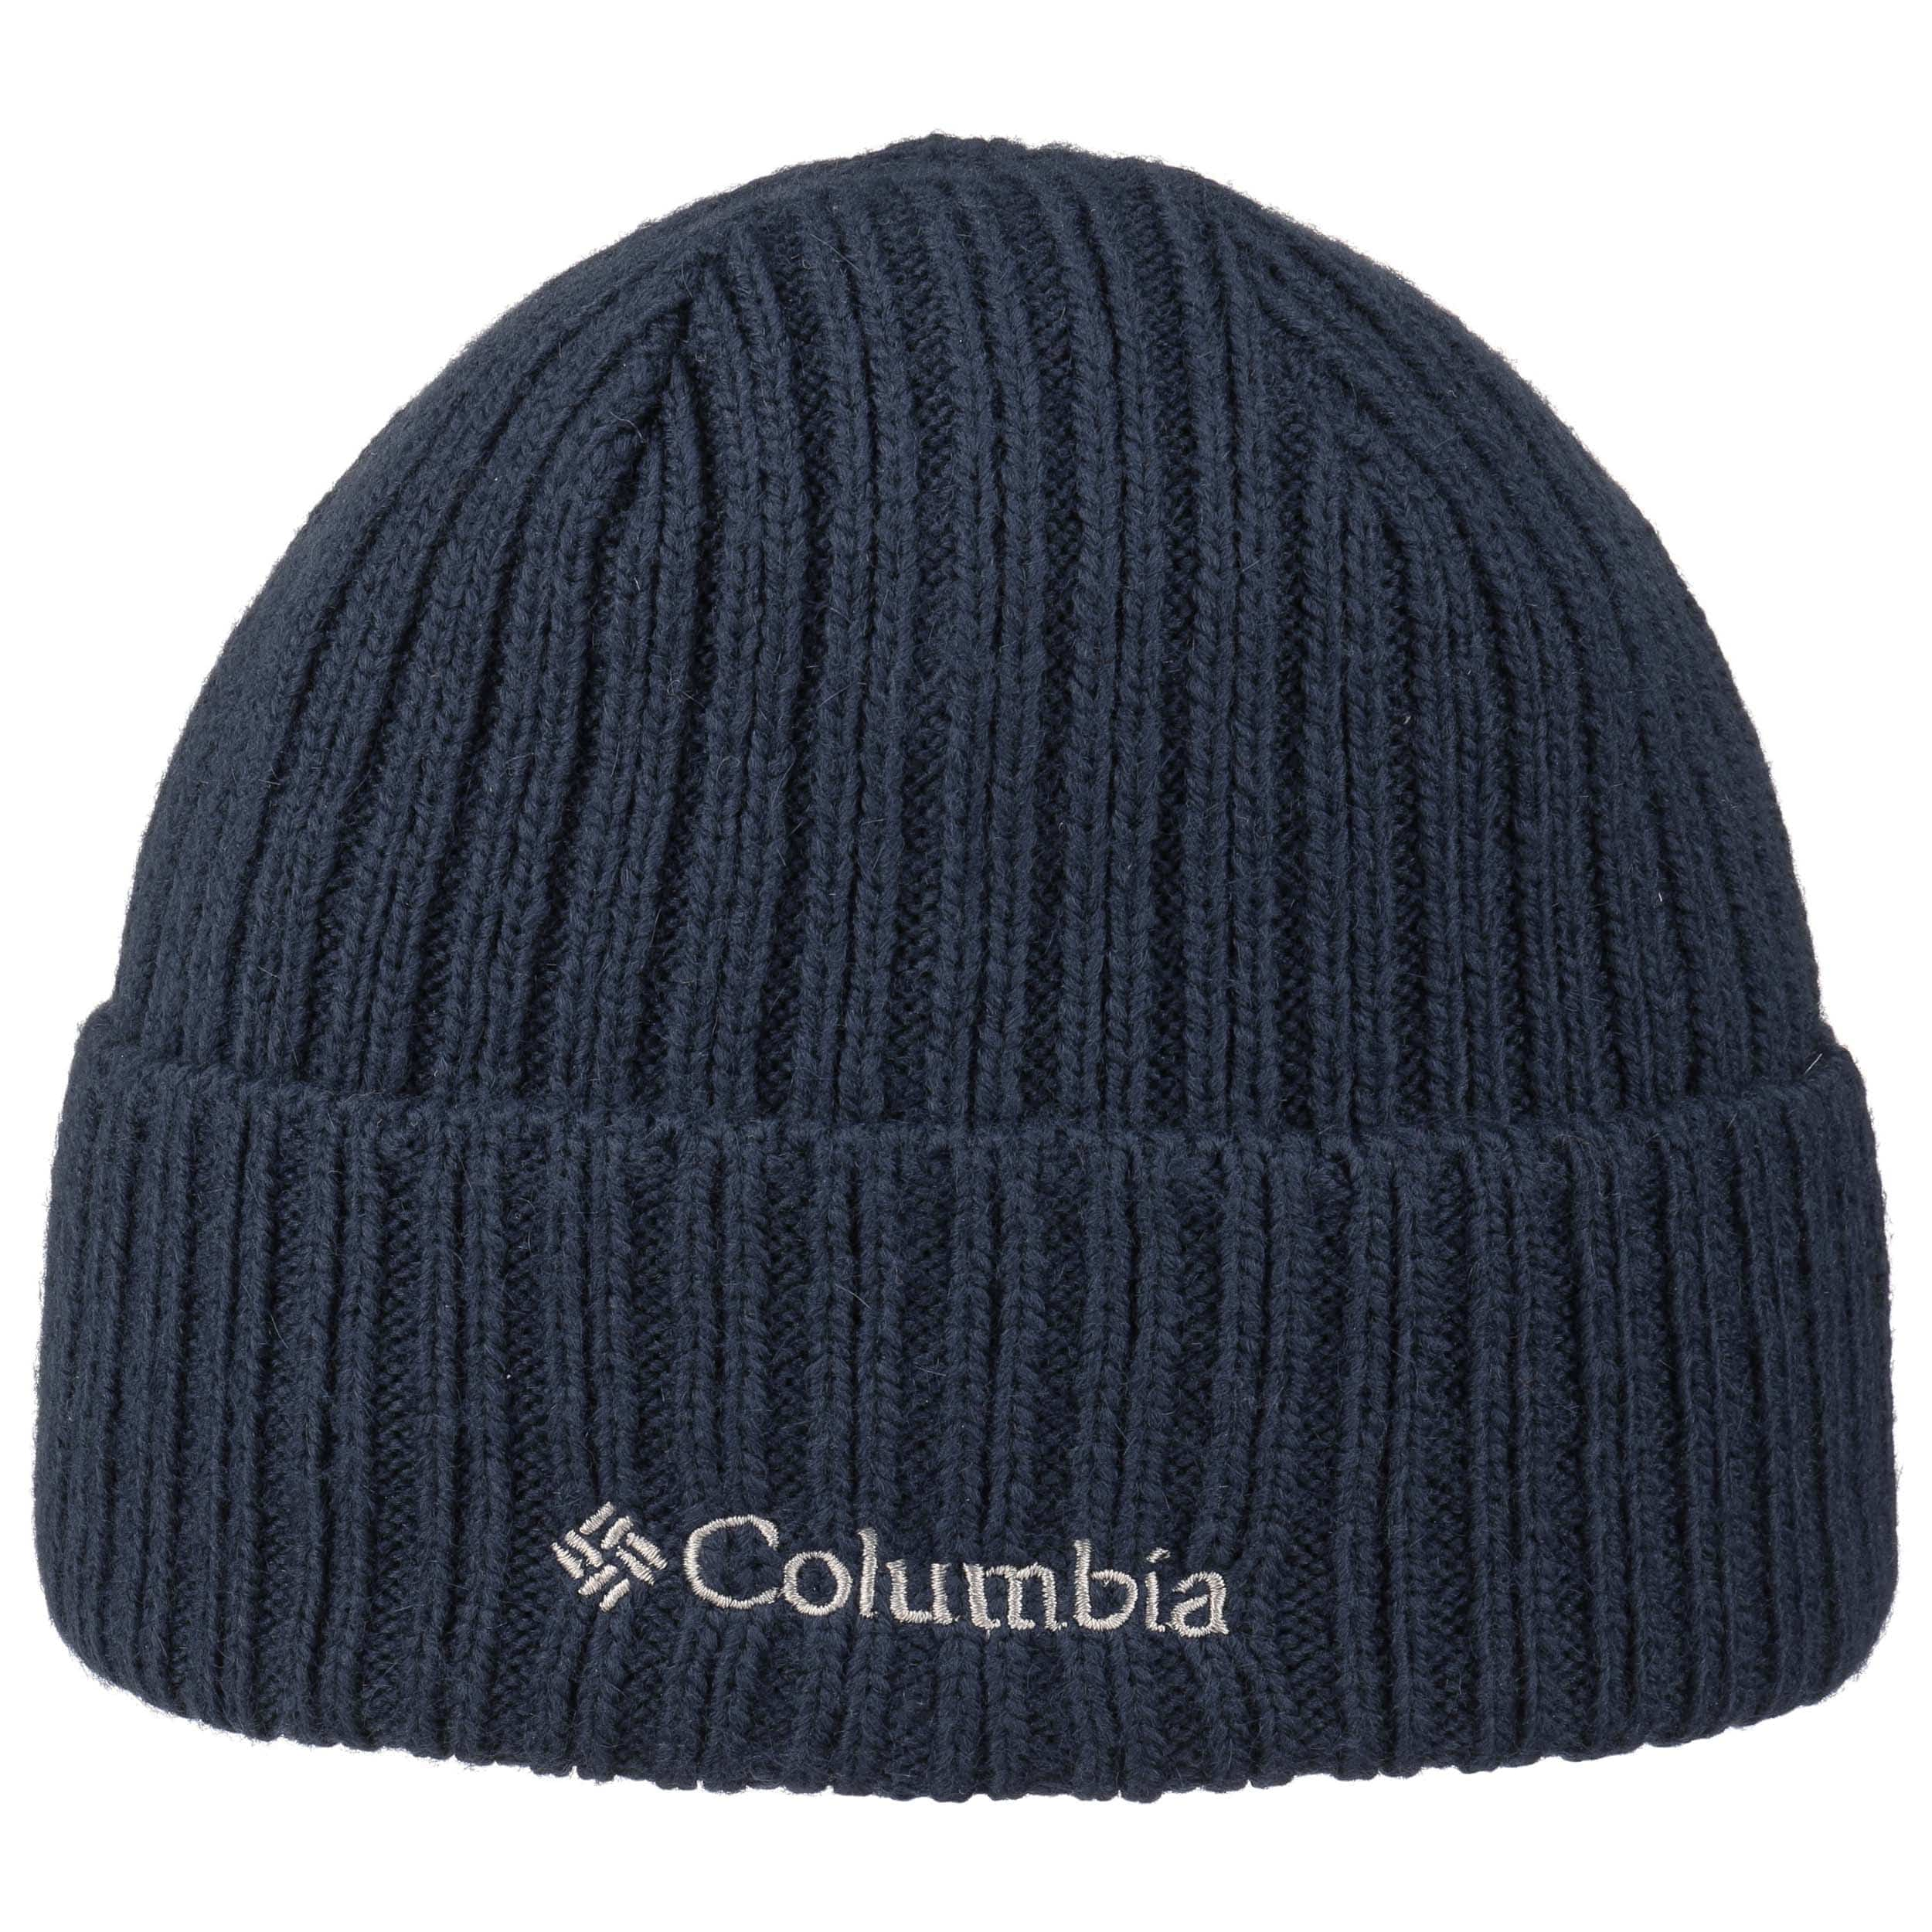 ... Watch Cap II Beanie by Columbia - navy 3 ... fb8b1077cb55